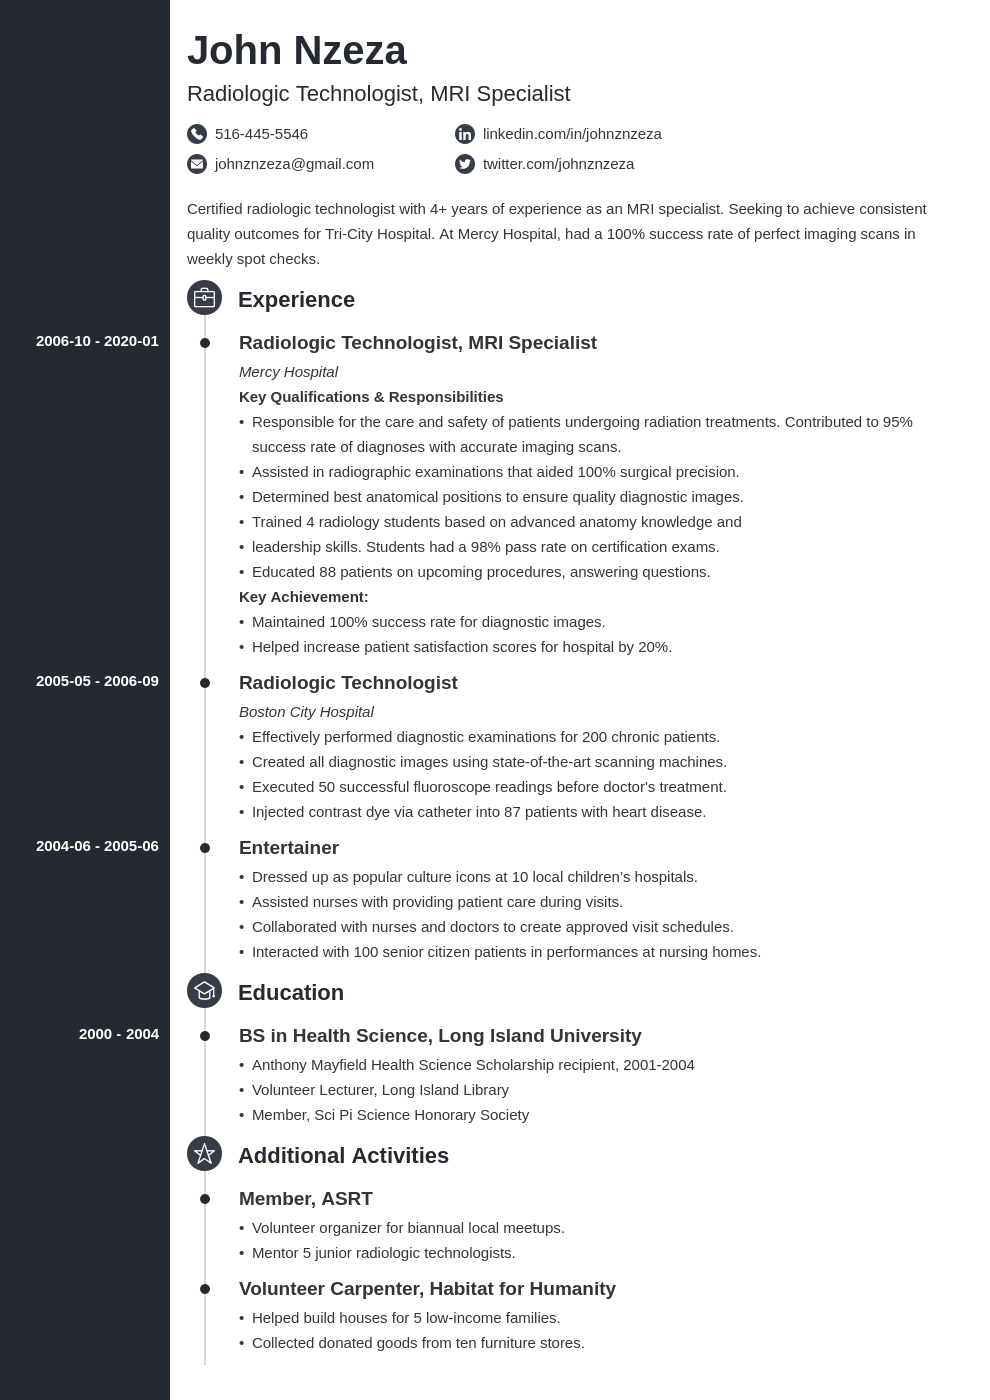 Radiologic Technologist Resume Example Template Concept In 2020 Resume Examples Radiology Technologist Resume